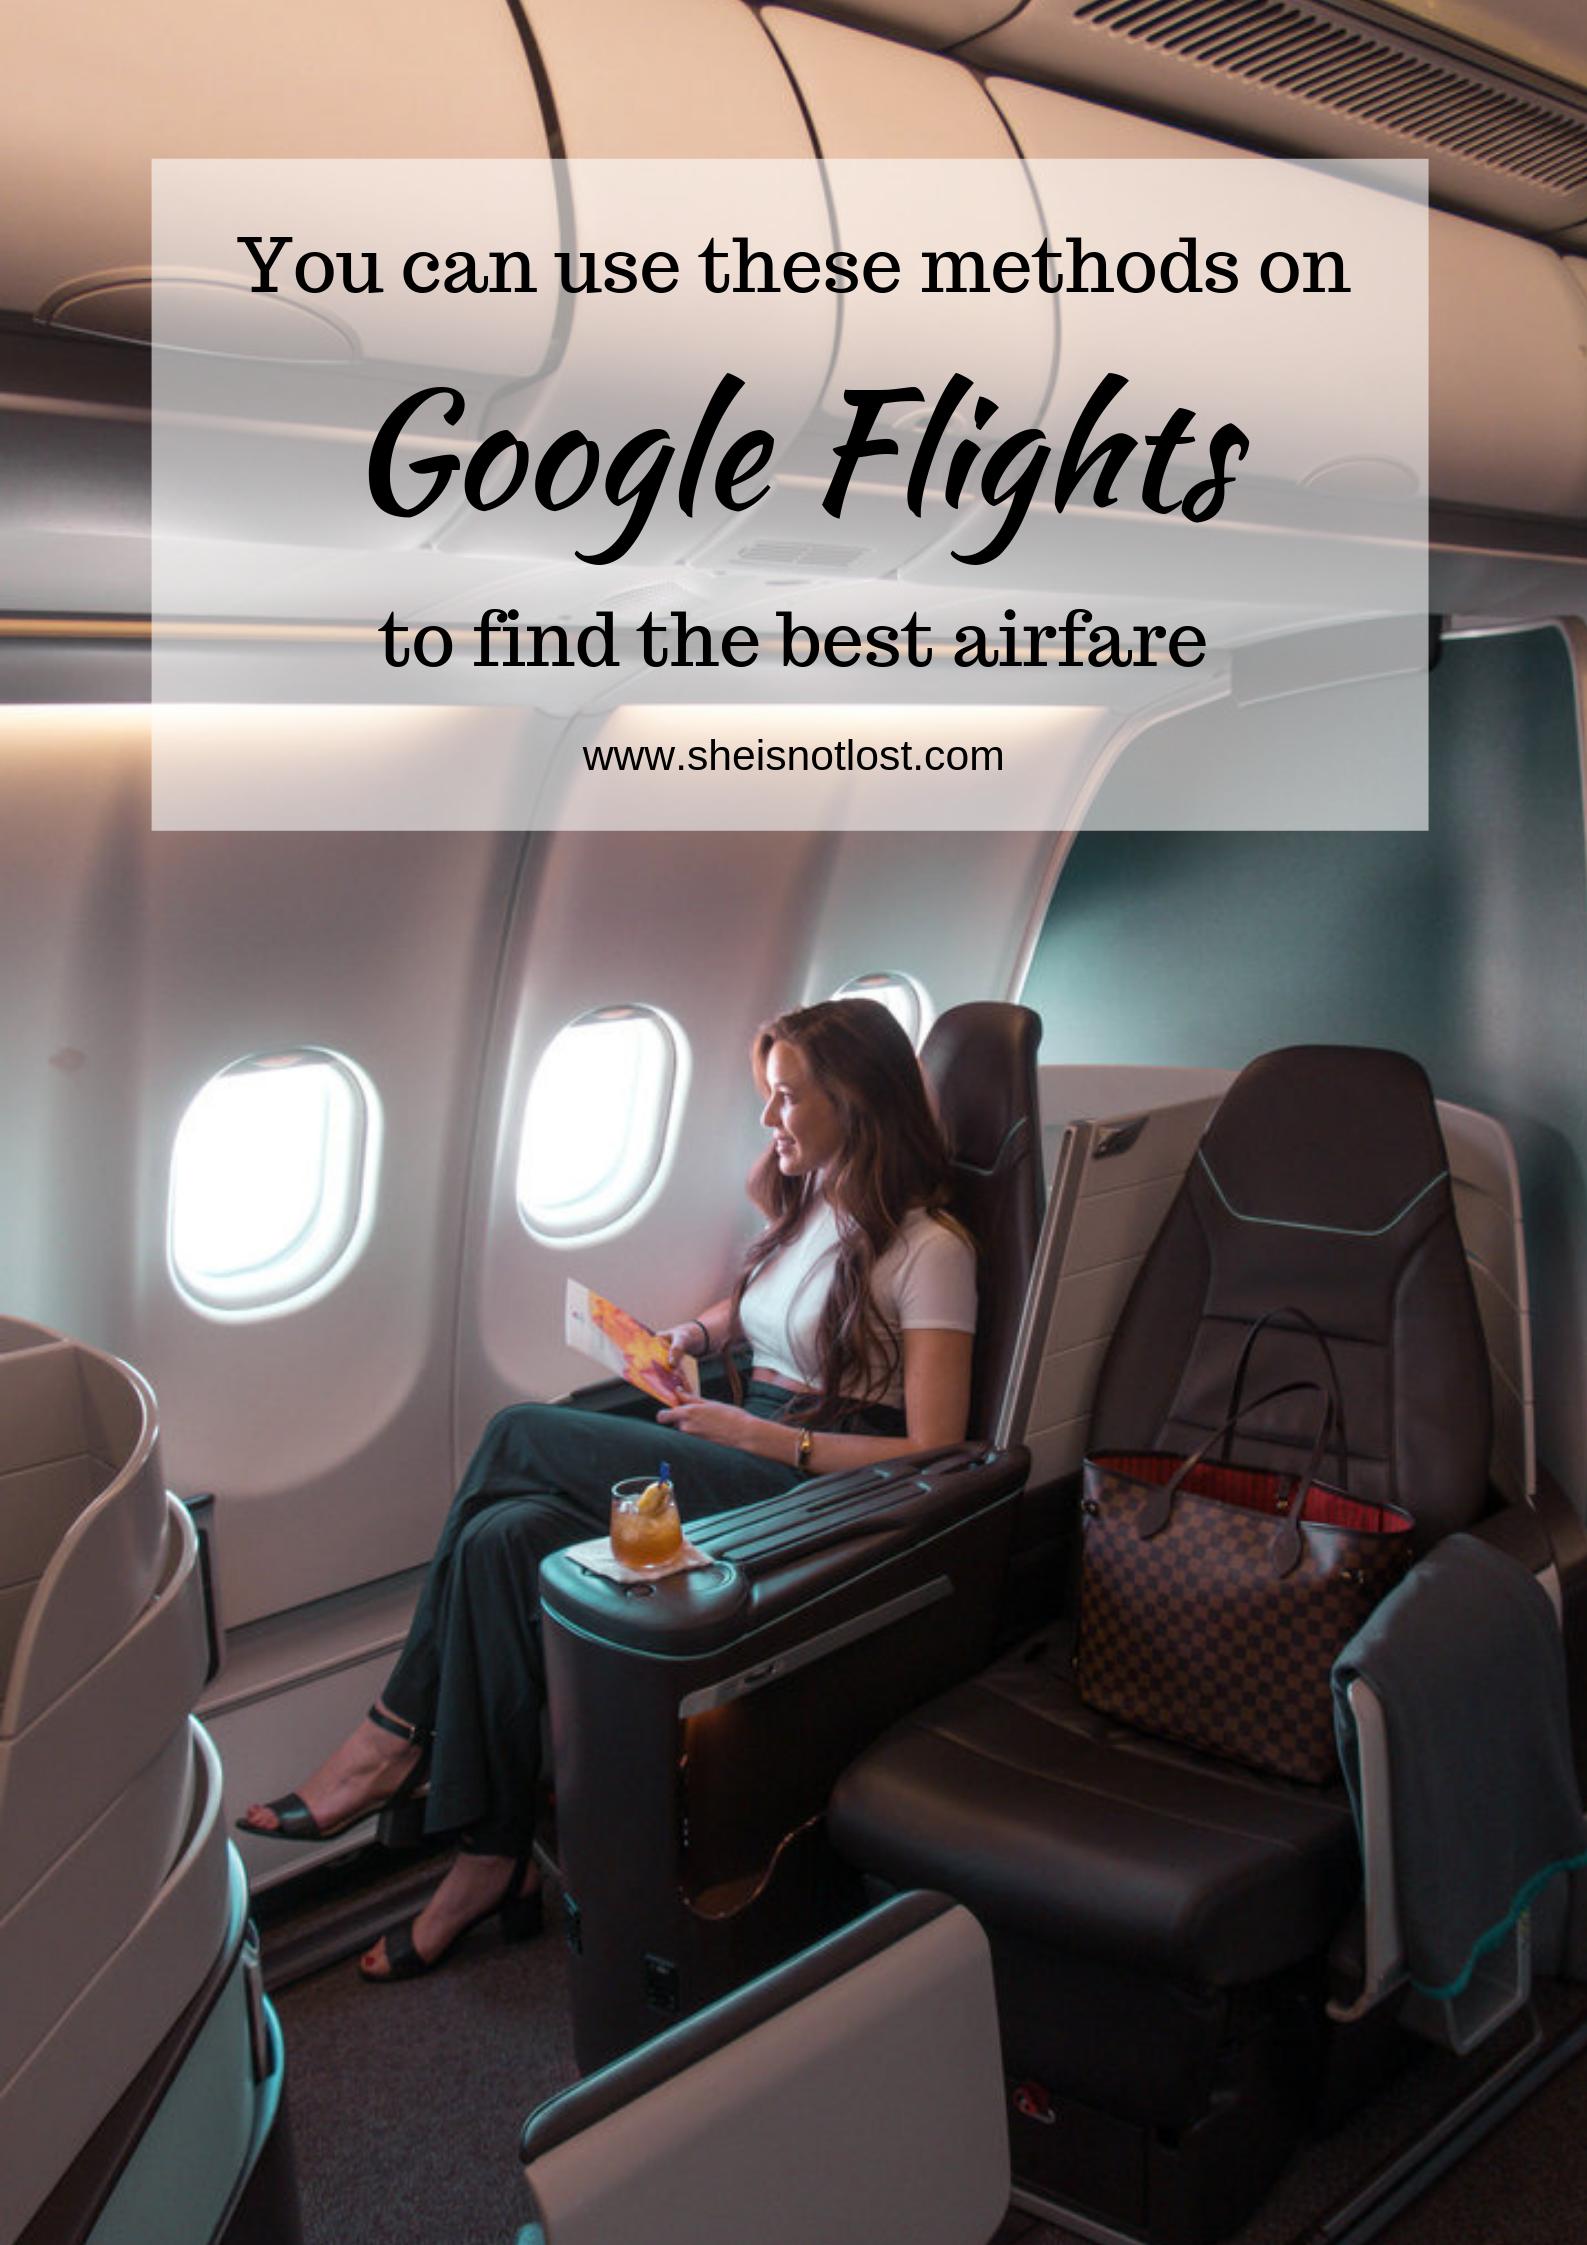 Google Flights best airfare methods.png